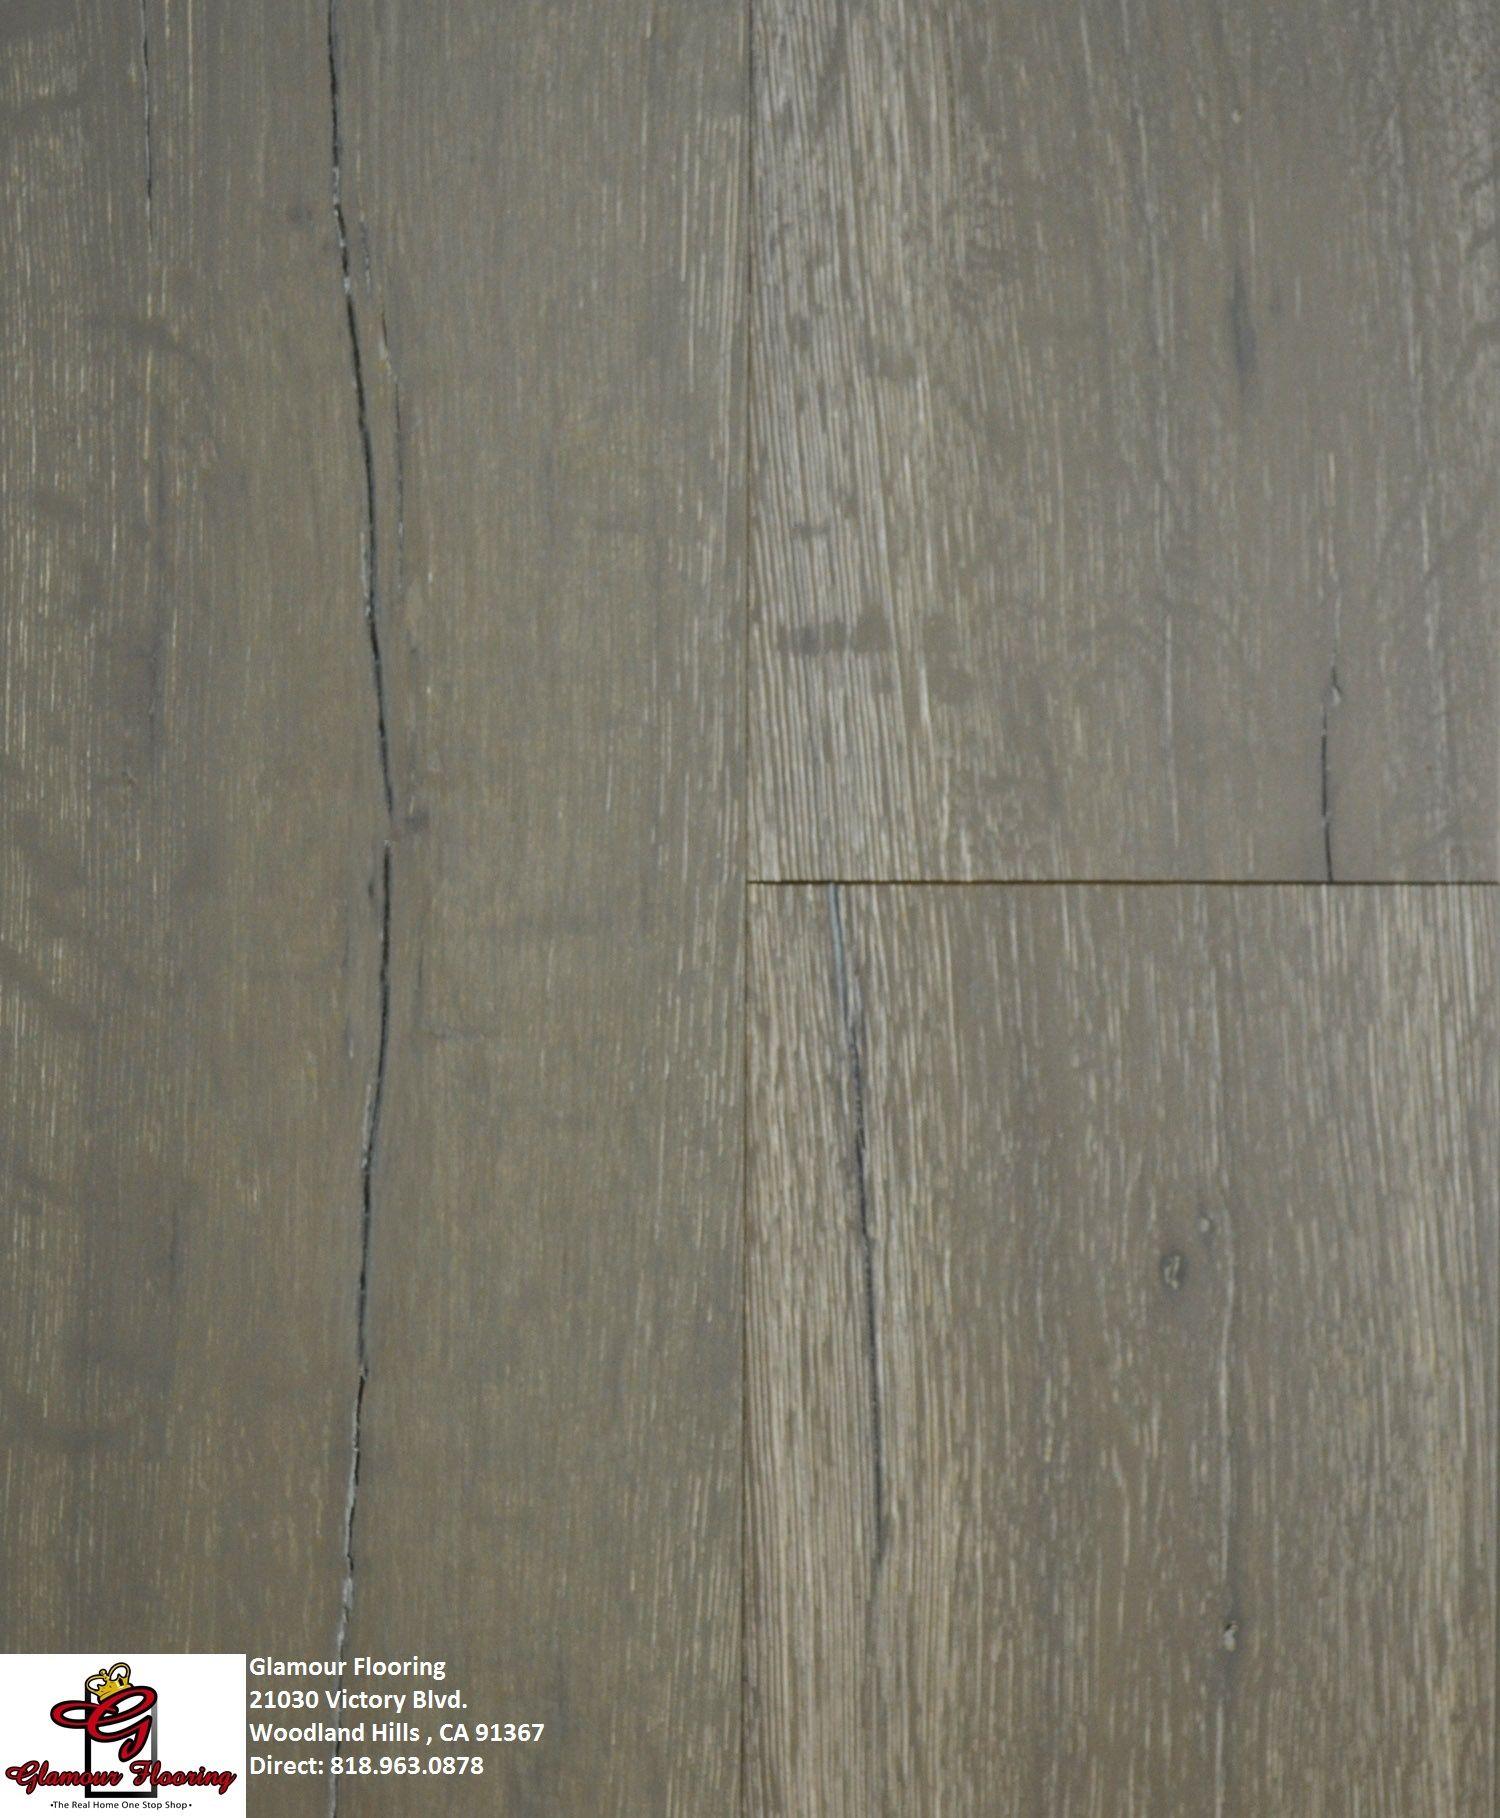 Color Oak Arctic Gray Sku Bm2t1fbrls Warranty 25 Year